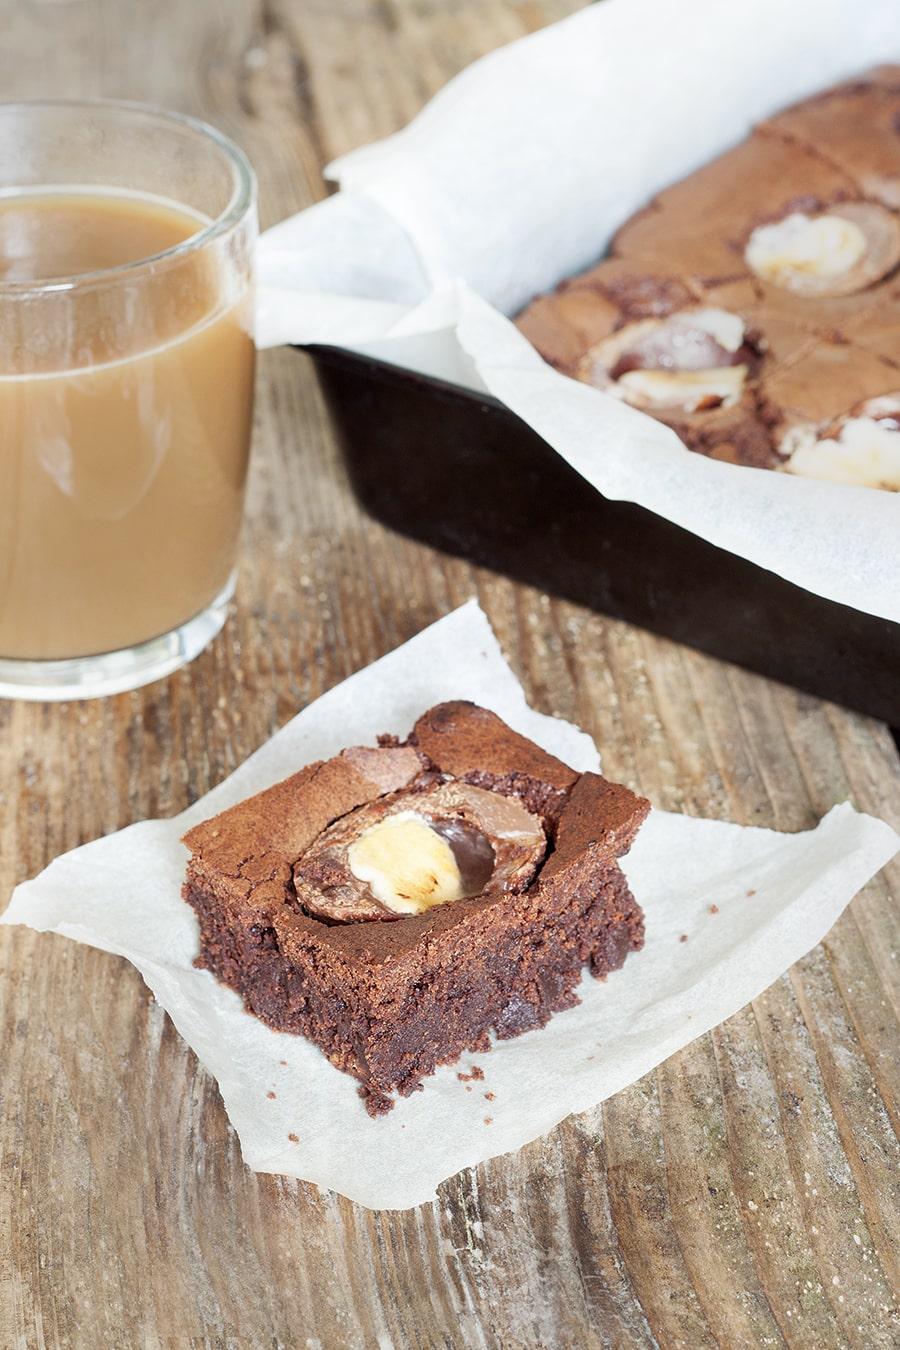 cadbury-creme-egg-brownies-scrumptious-recipe-3